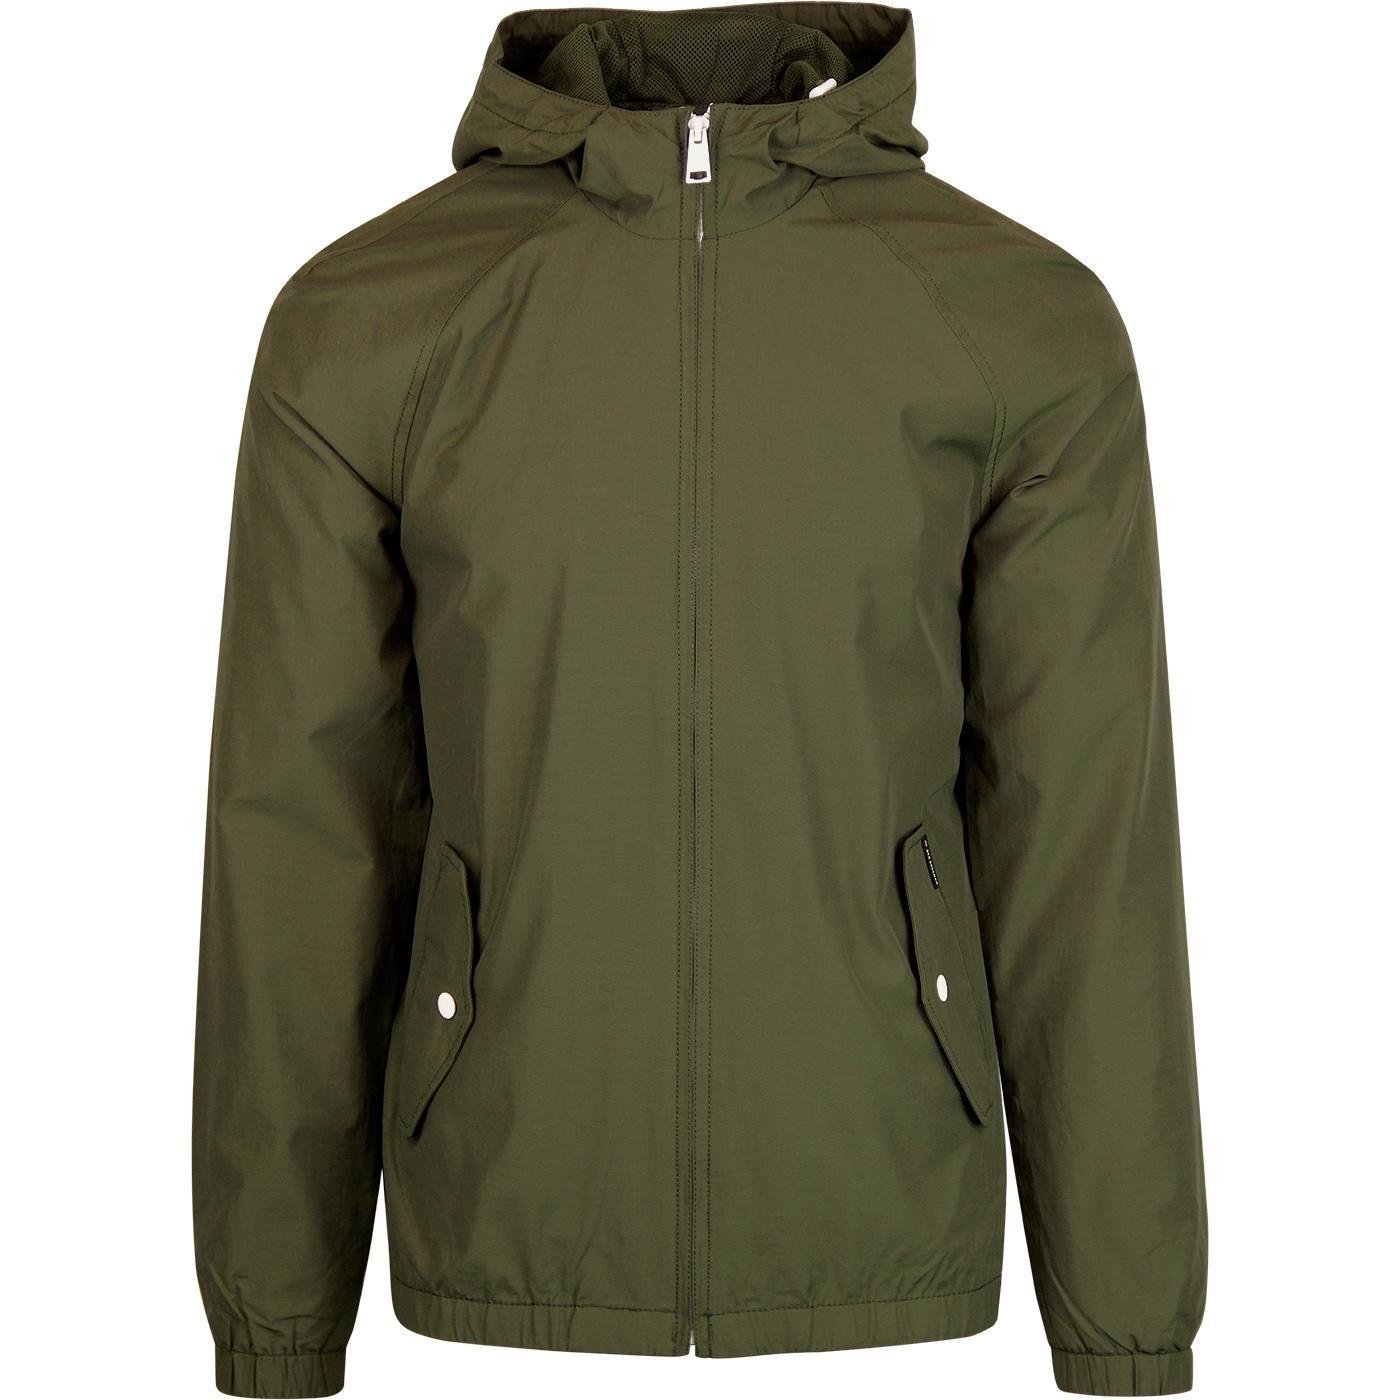 BEN SHERMAN Retro Mod Casual Hooded Jacket (Khaki)